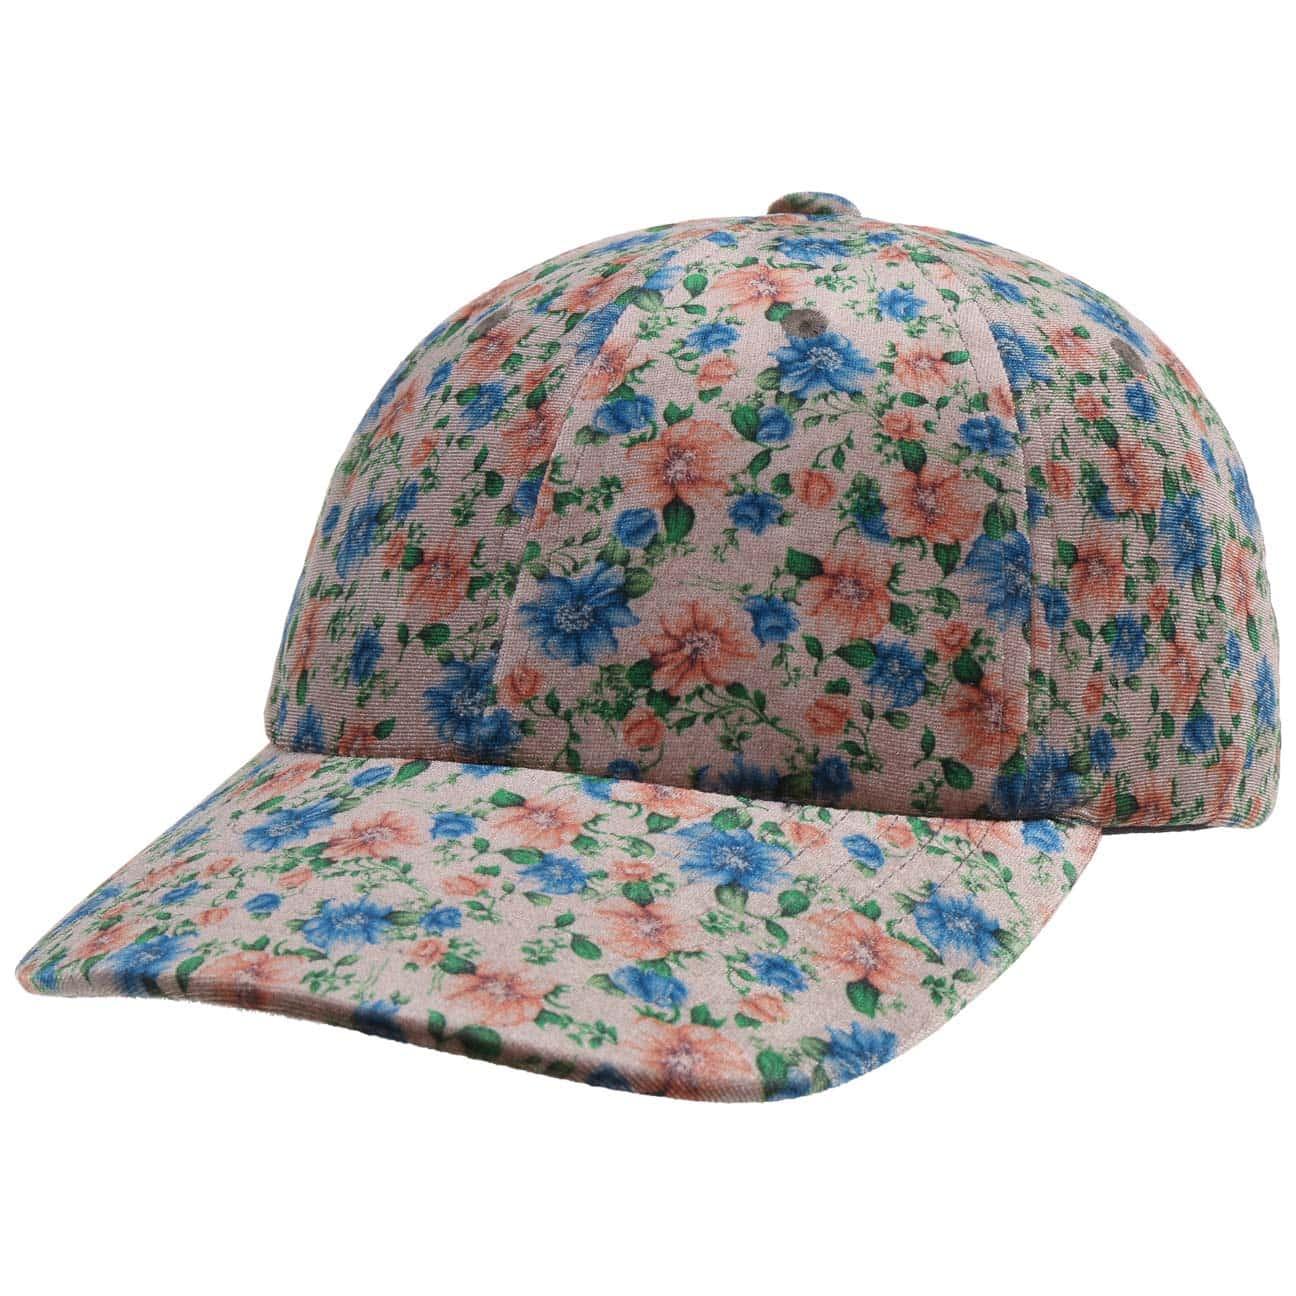 Gorra Belford by Brixton  strapback cap